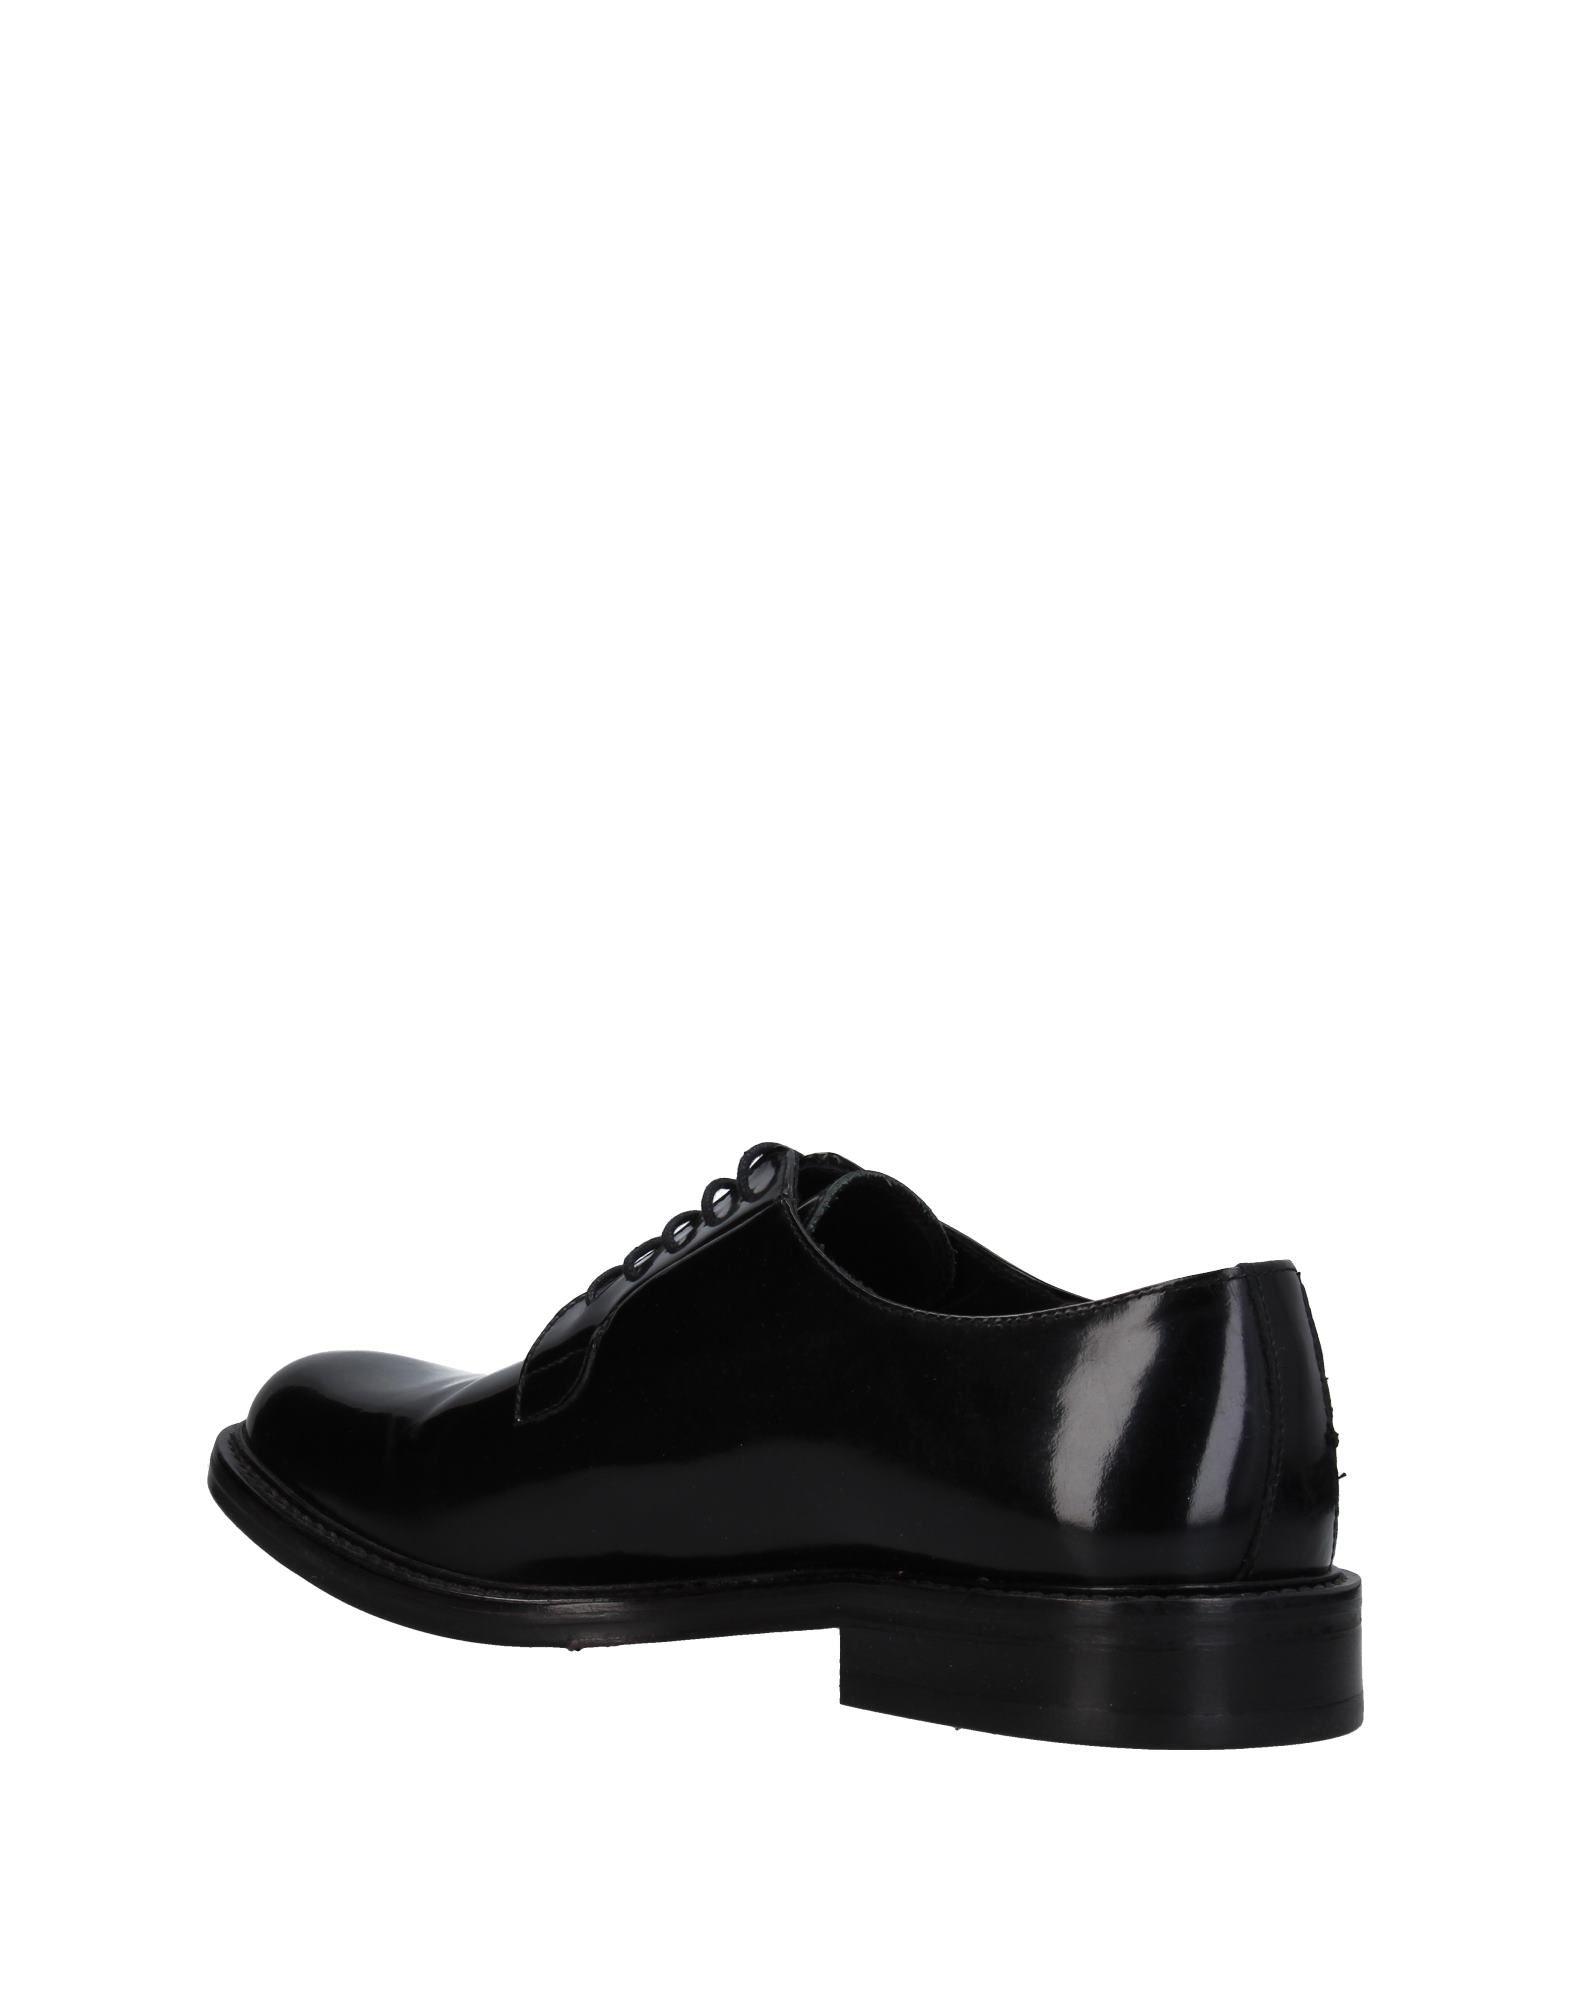 Chaussures À Lacets Calzoleria Napoletana  1921 Homme - Chaussures À Lacets Calzoleria Napoletana  1921 sur